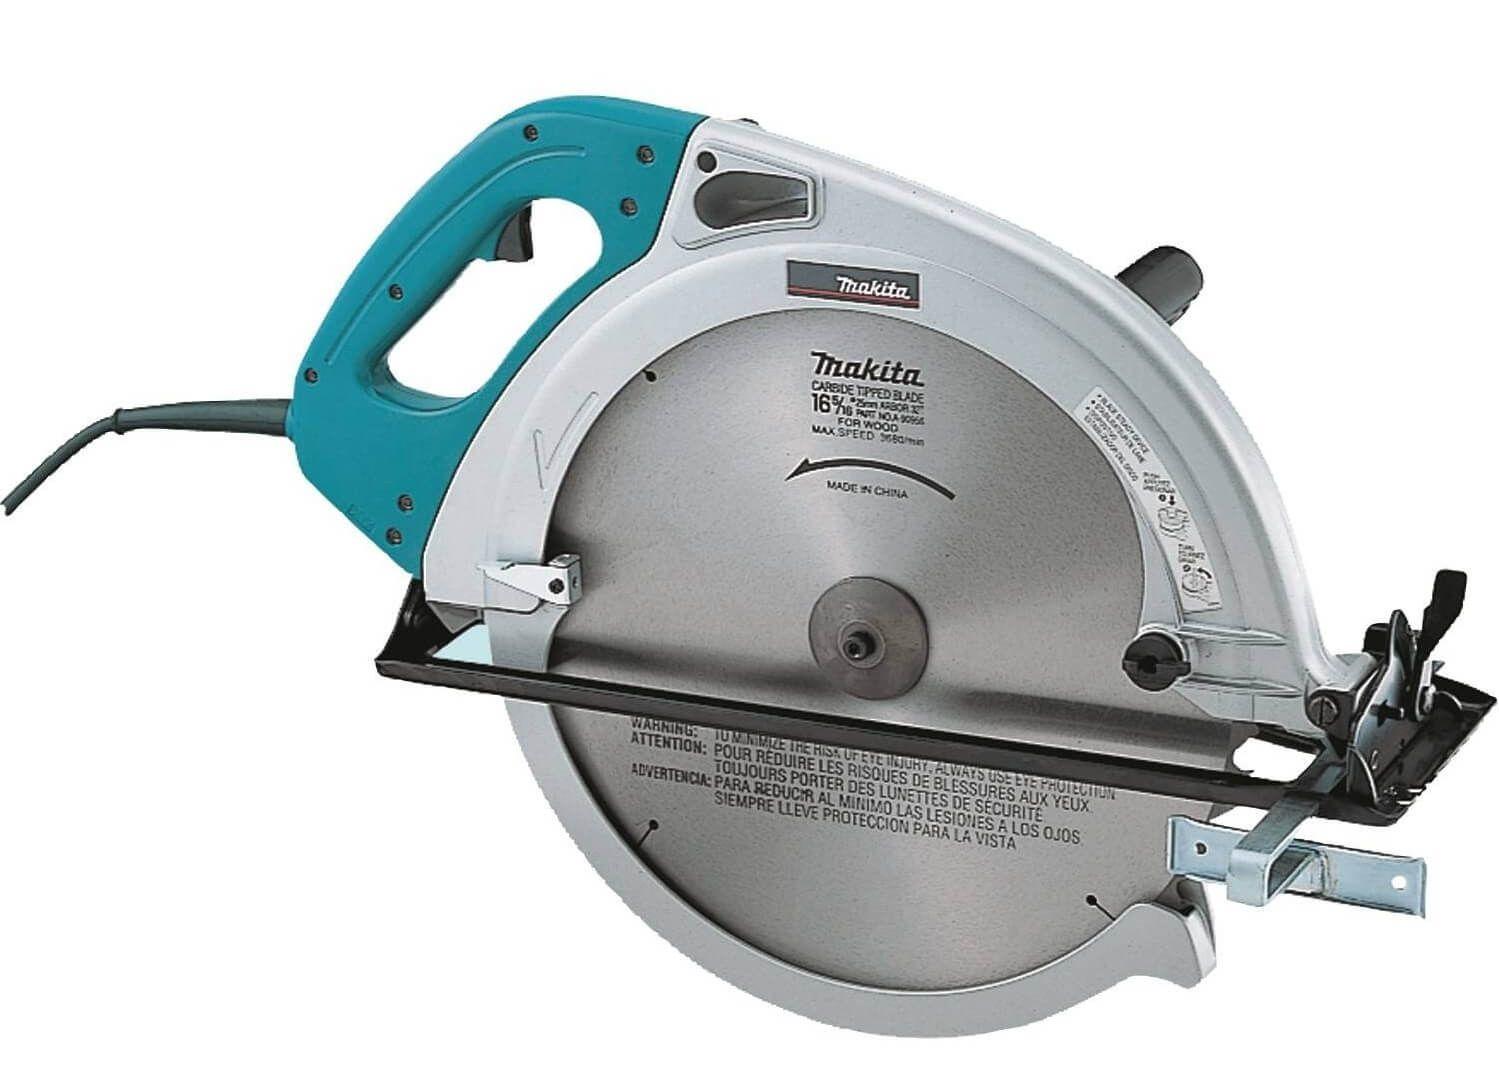 makita beam saw 5402na review - Metal Framing Tools